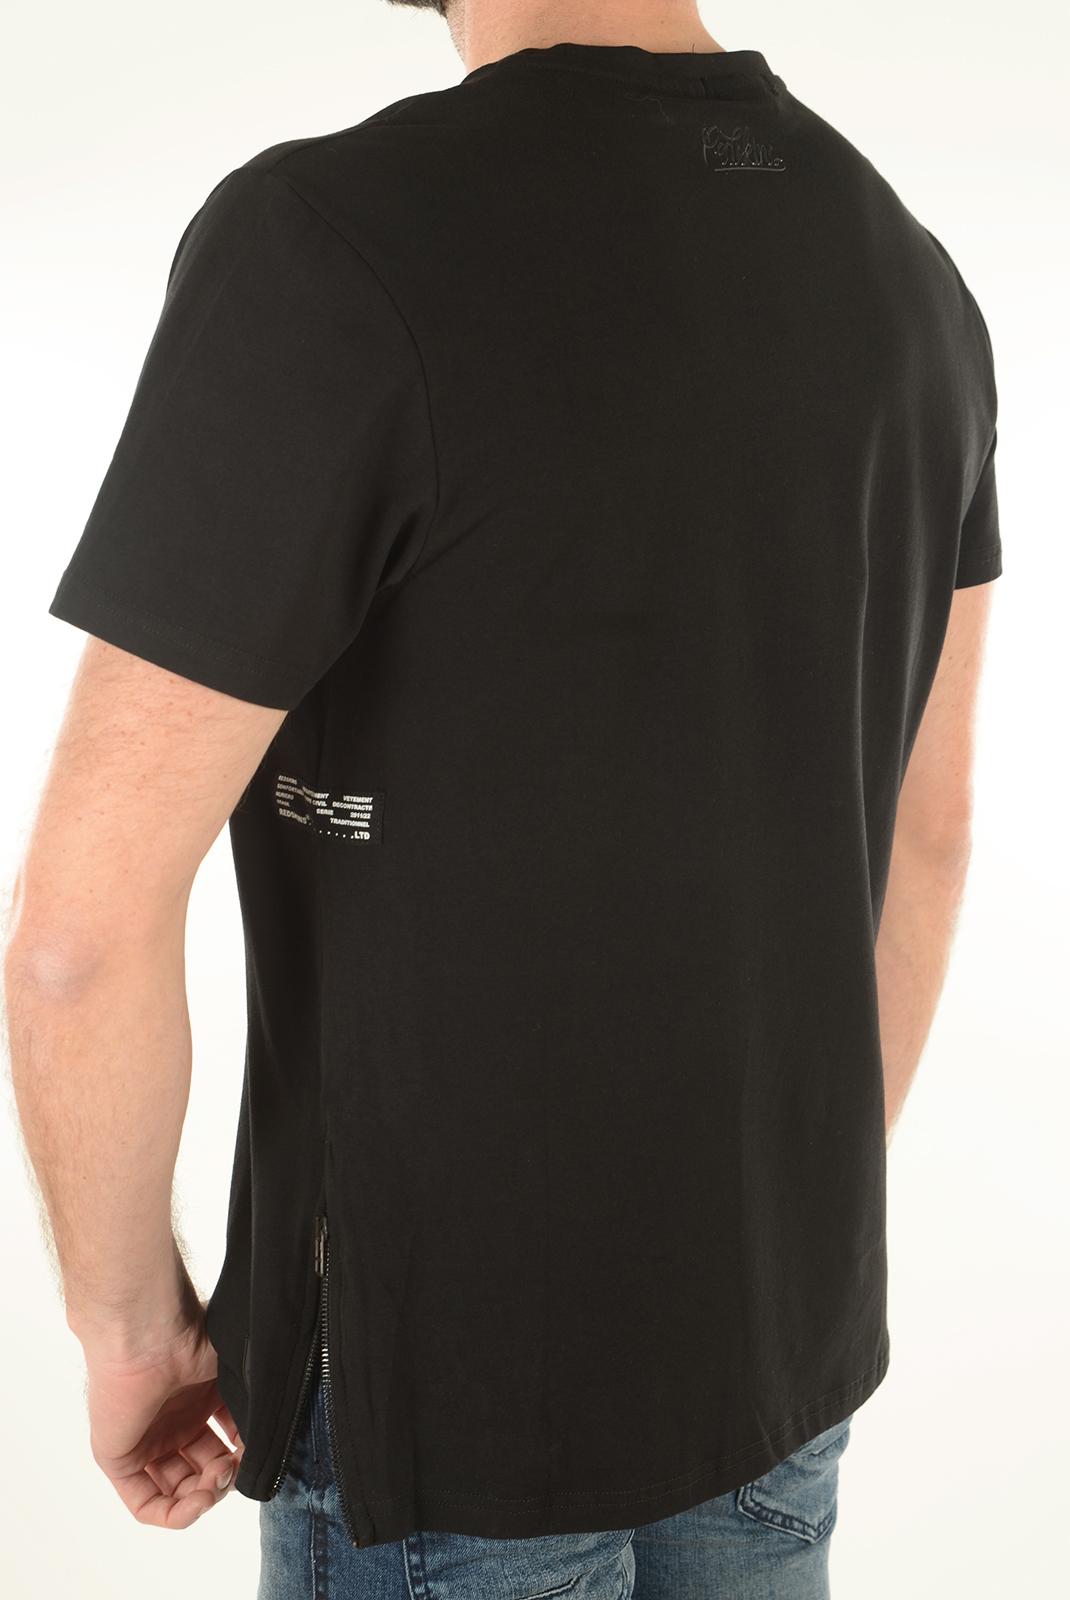 Tee-shirts  Redskins HERCULES CERES BLACK